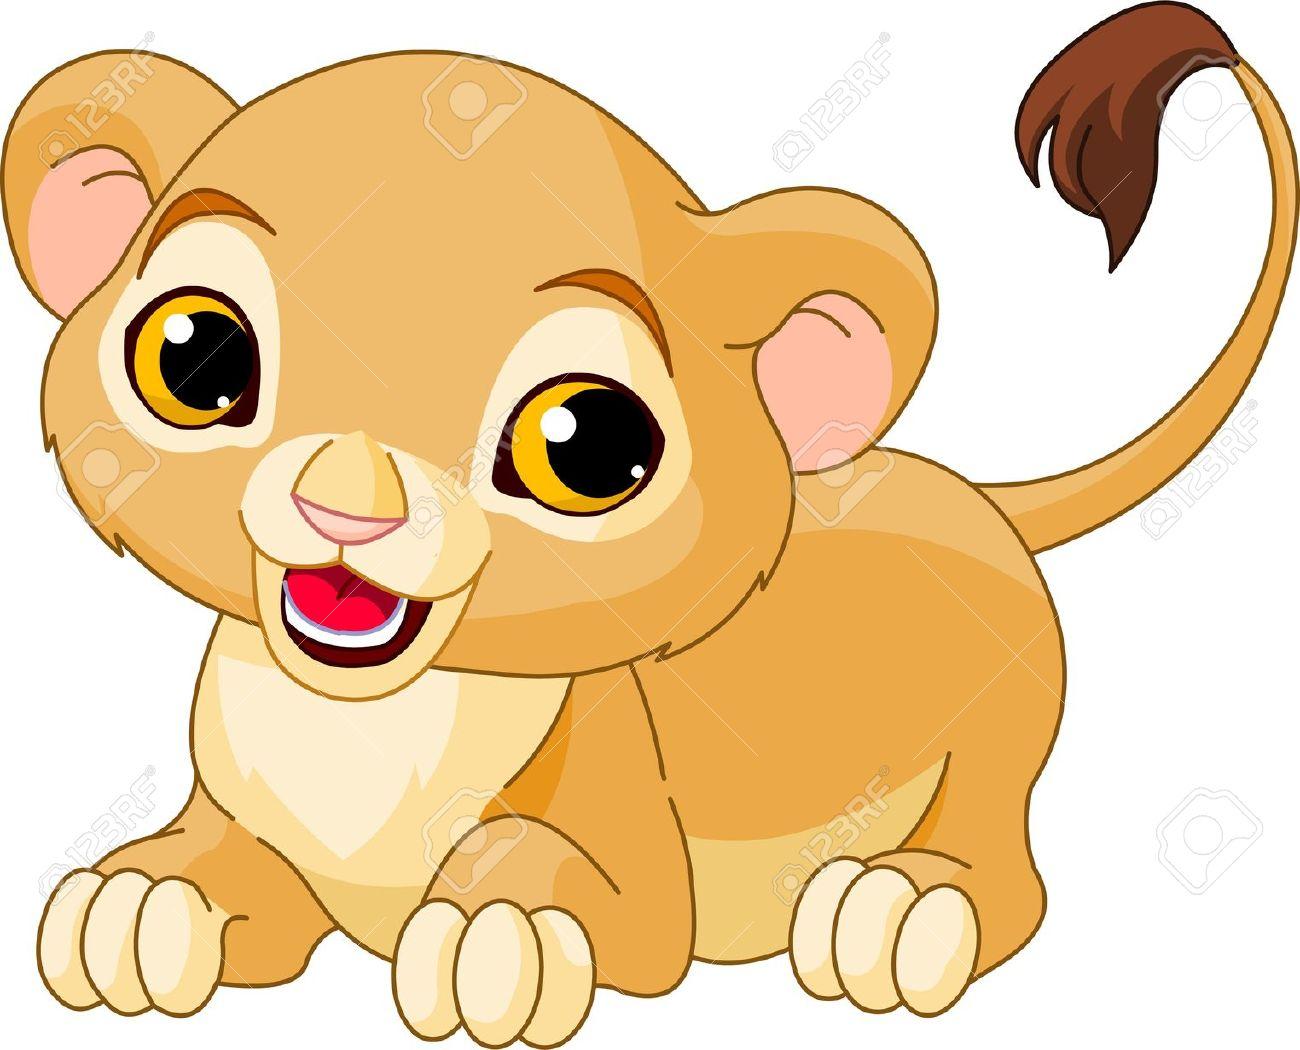 Clipart of a lion cub svg freeuse library Lion cub clipart 5 » Clipart Station svg freeuse library